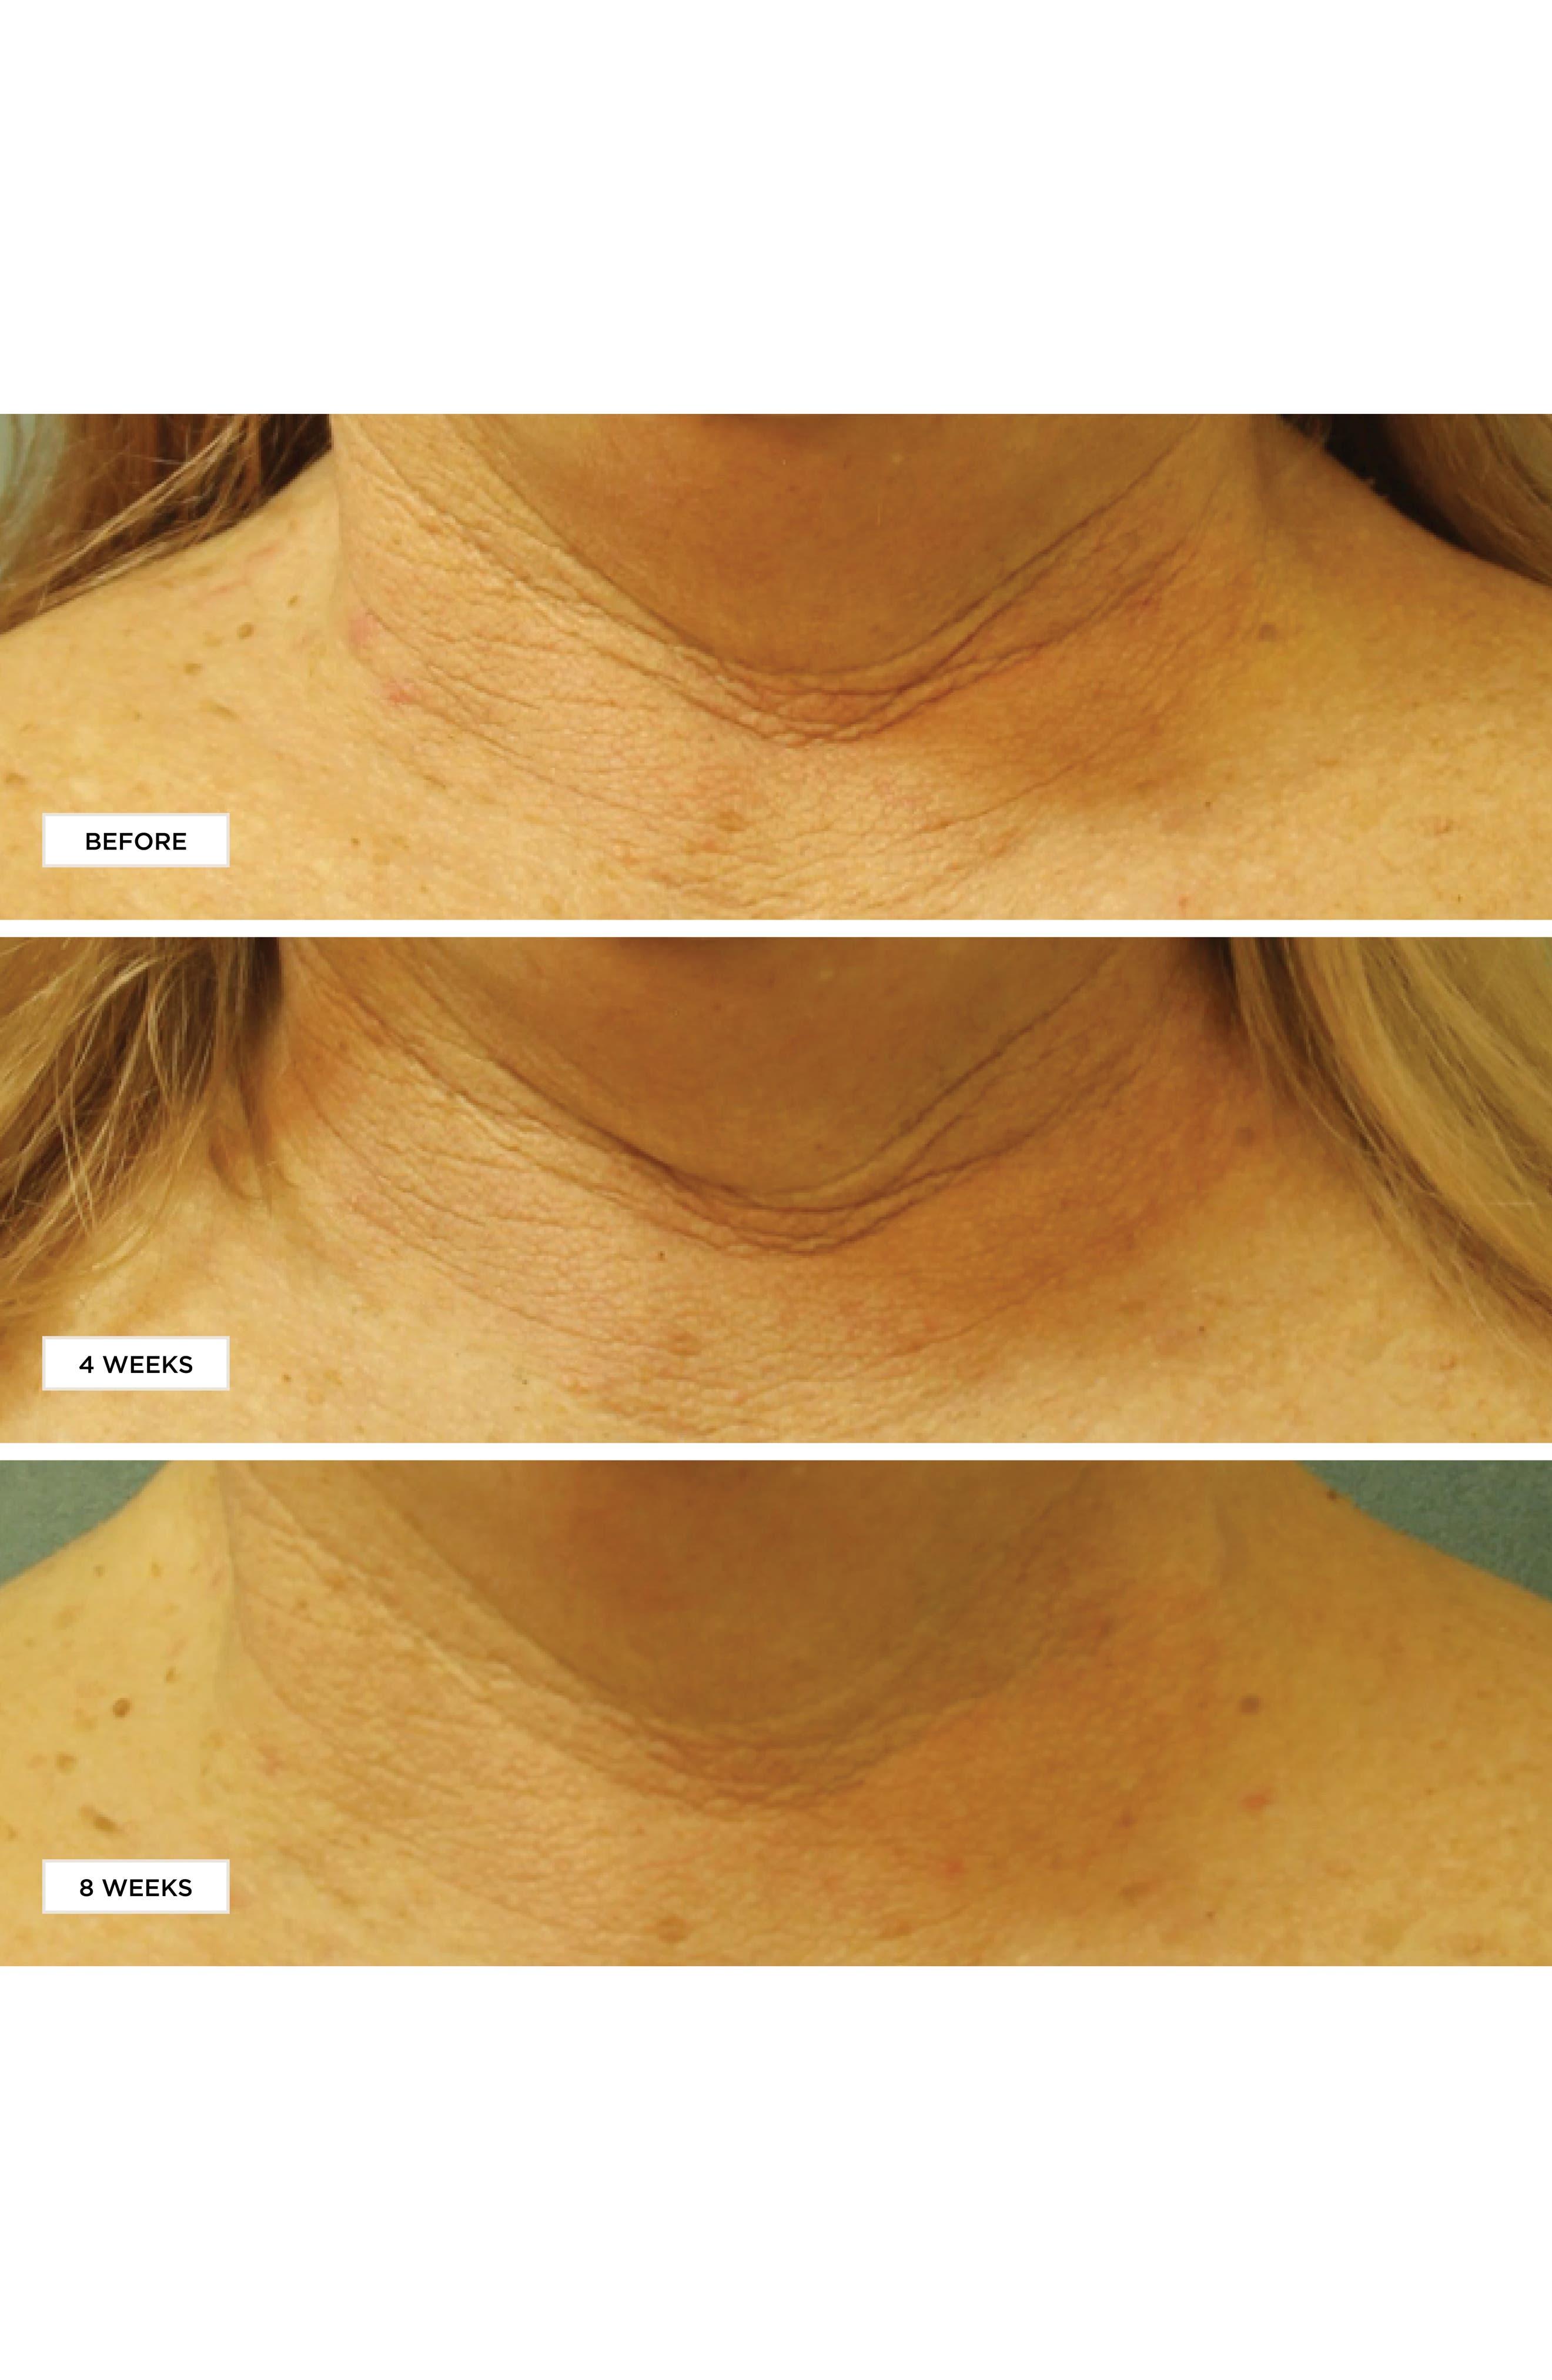 Neuropeptide Restorative Neck & Chest Therapy SPF 25,                             Alternate thumbnail 3, color,                             No Color